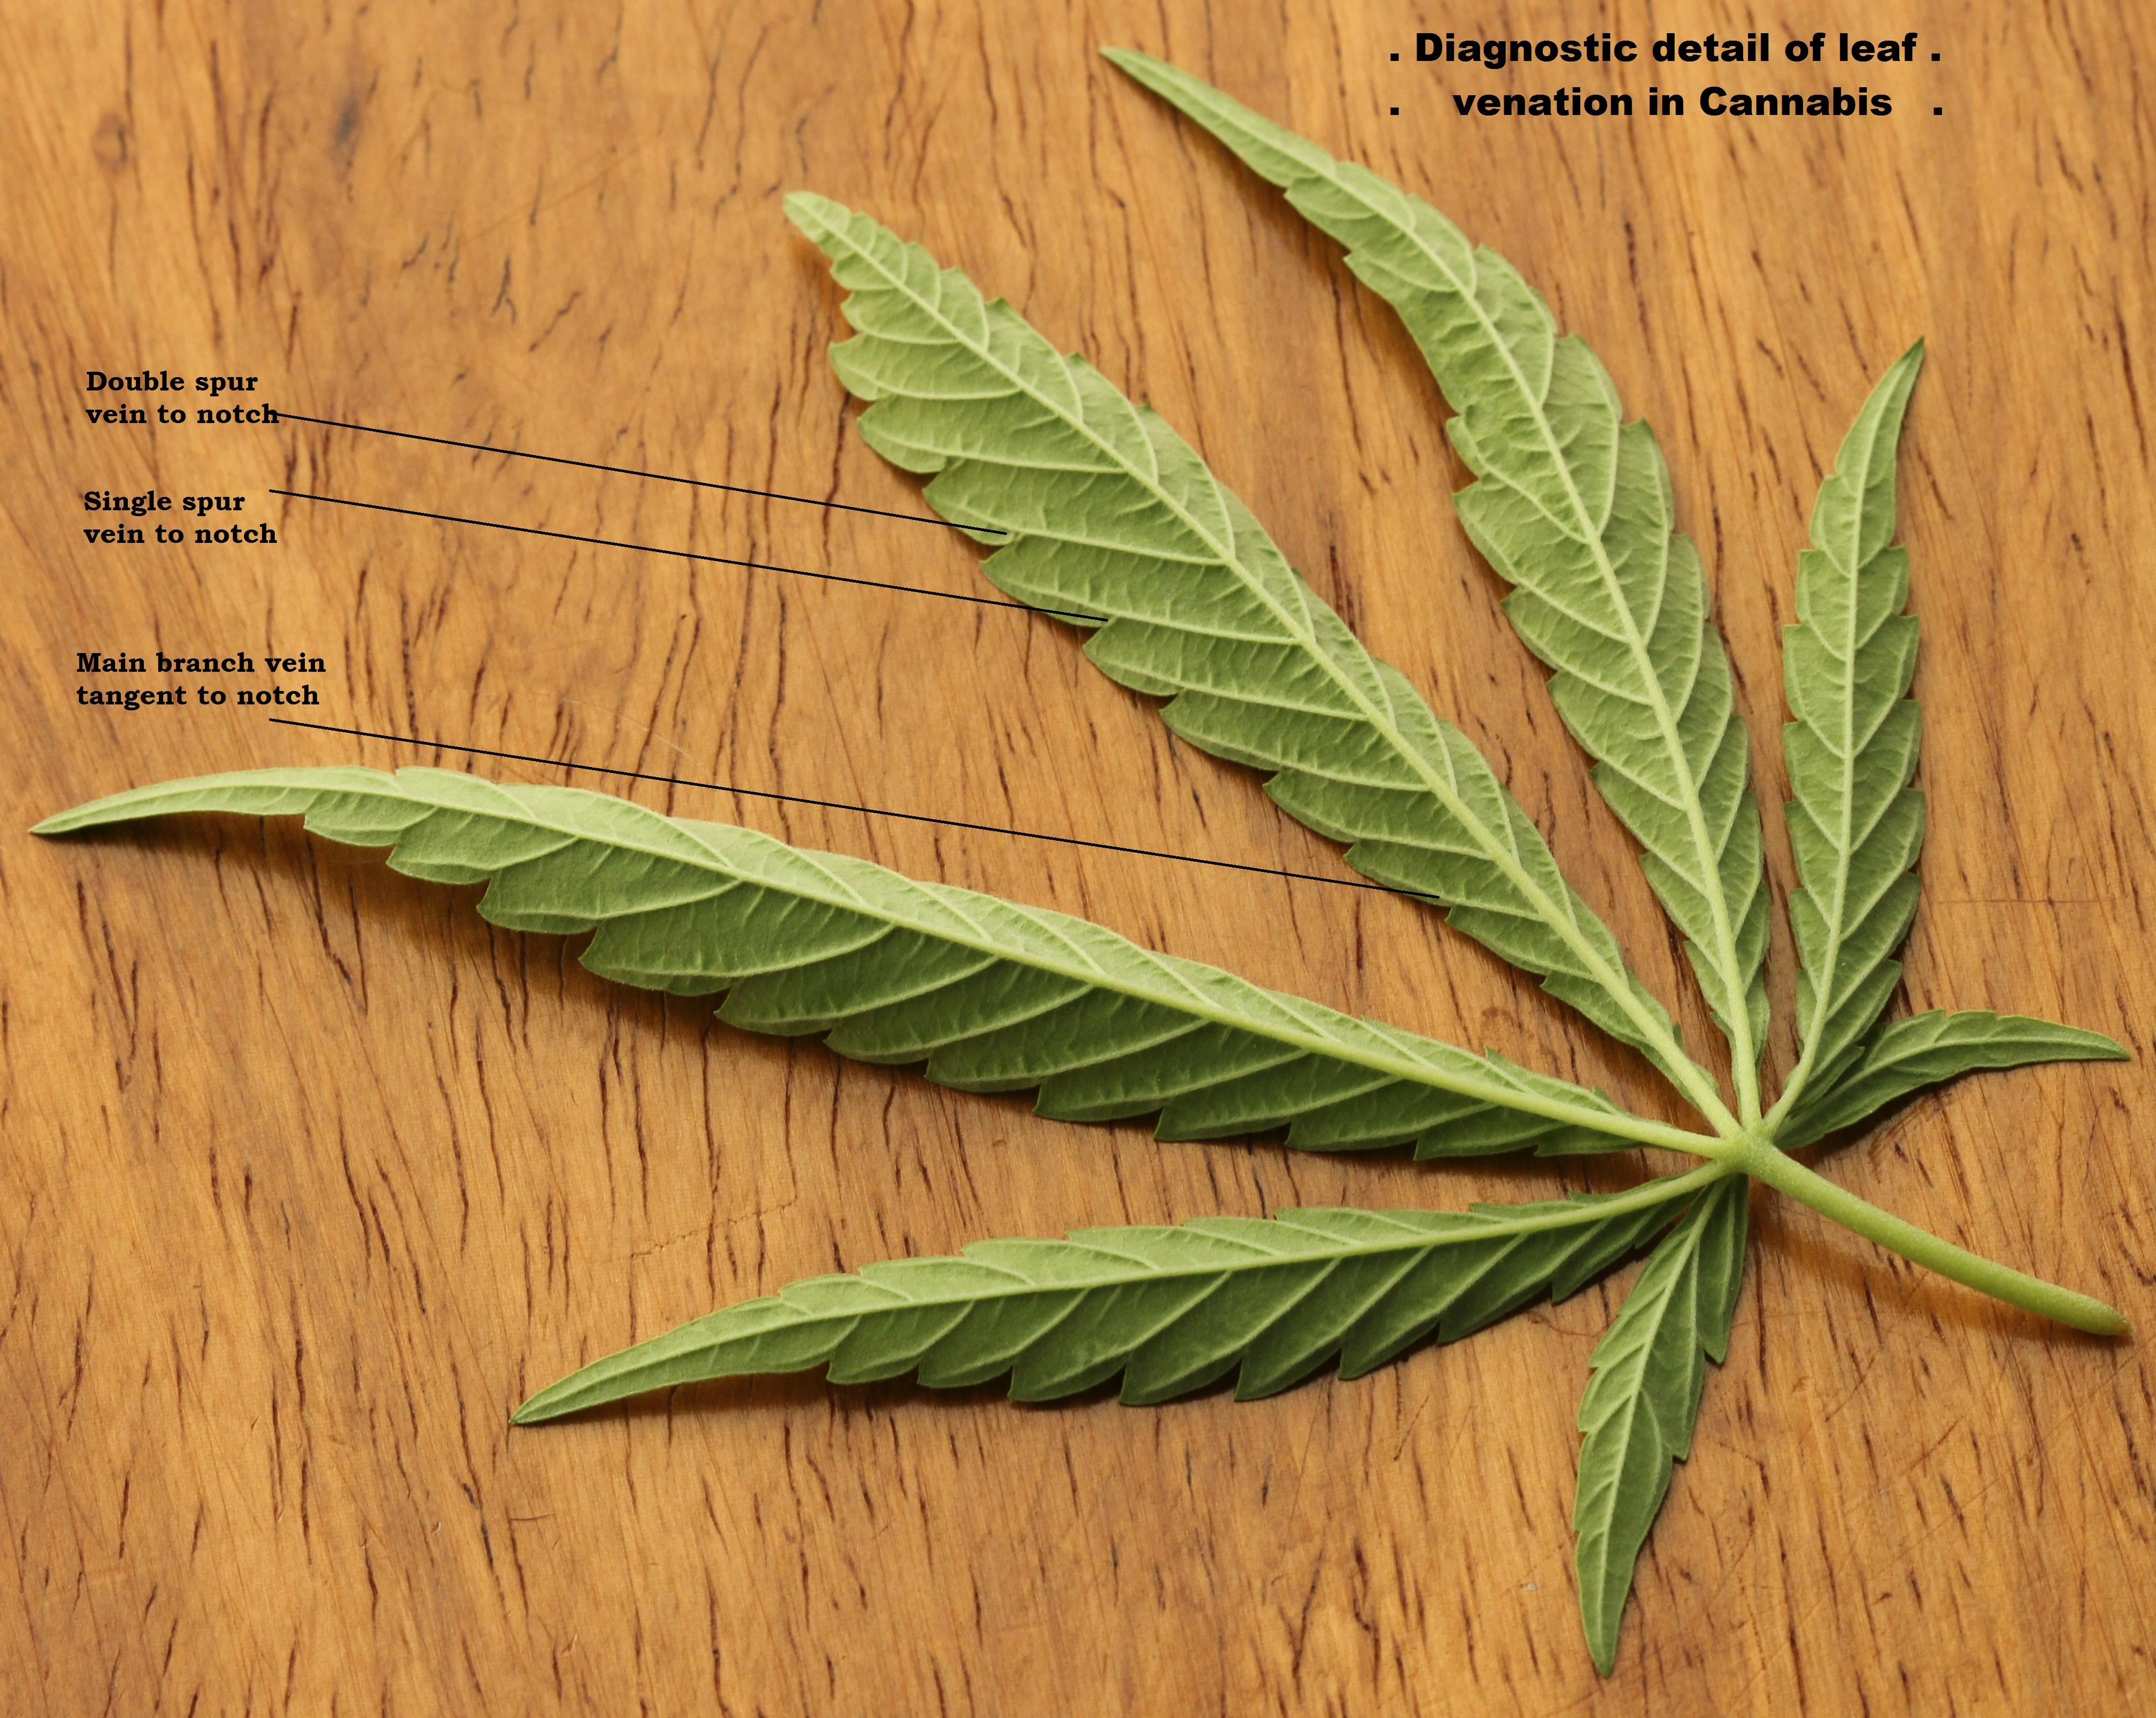 Underside of Cannabis sativa leaf, showing diagnostic venation